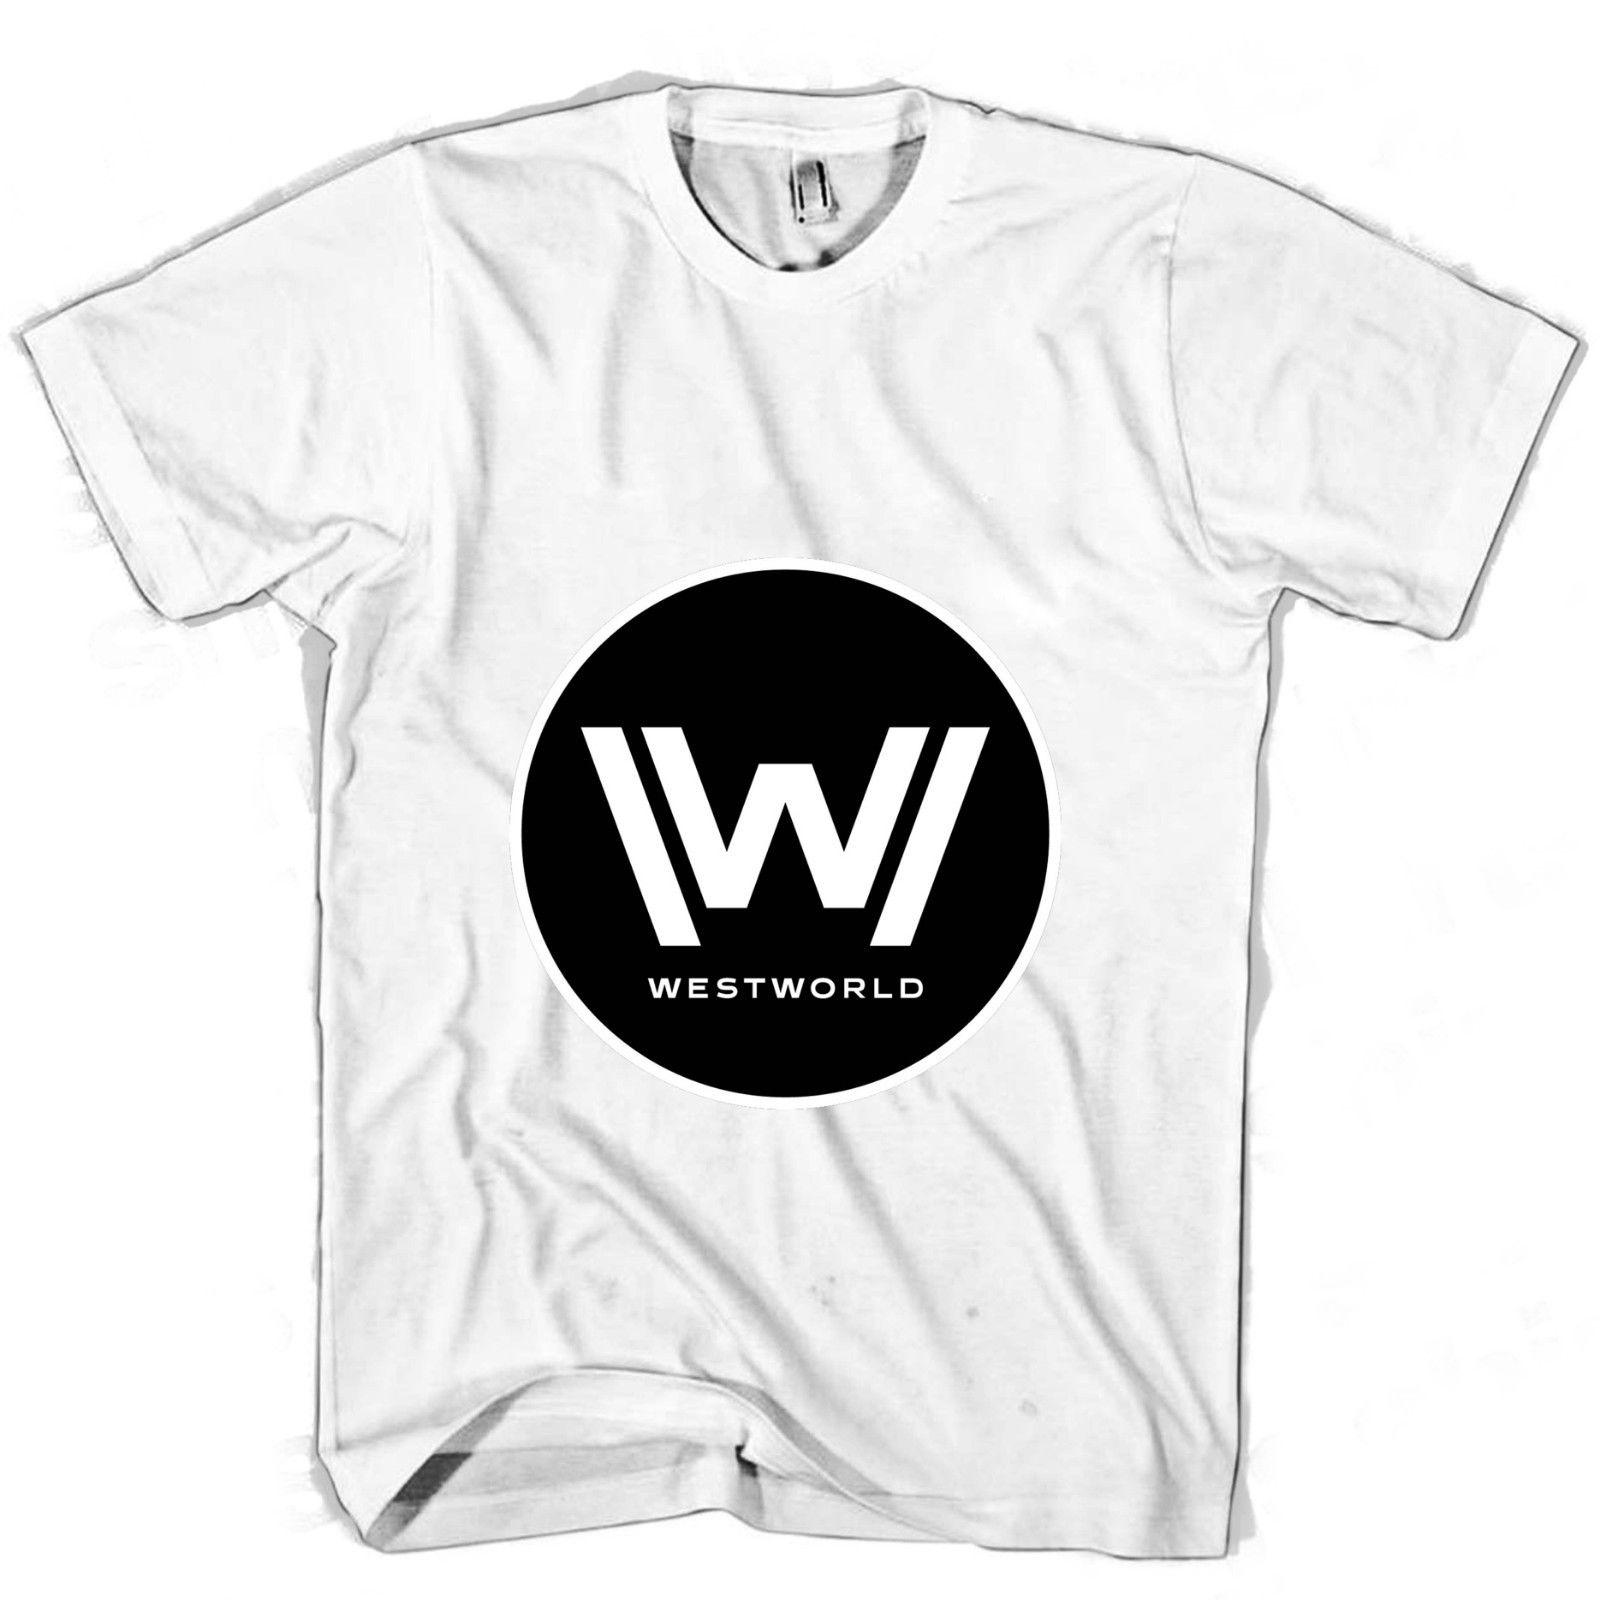 835e16a1df6c Westworld Block Men's / Women's T Shirt wholesale free shipping New  Brand-Clothing Top Tee Men T Shirt 2018 Summer 100% Cotton